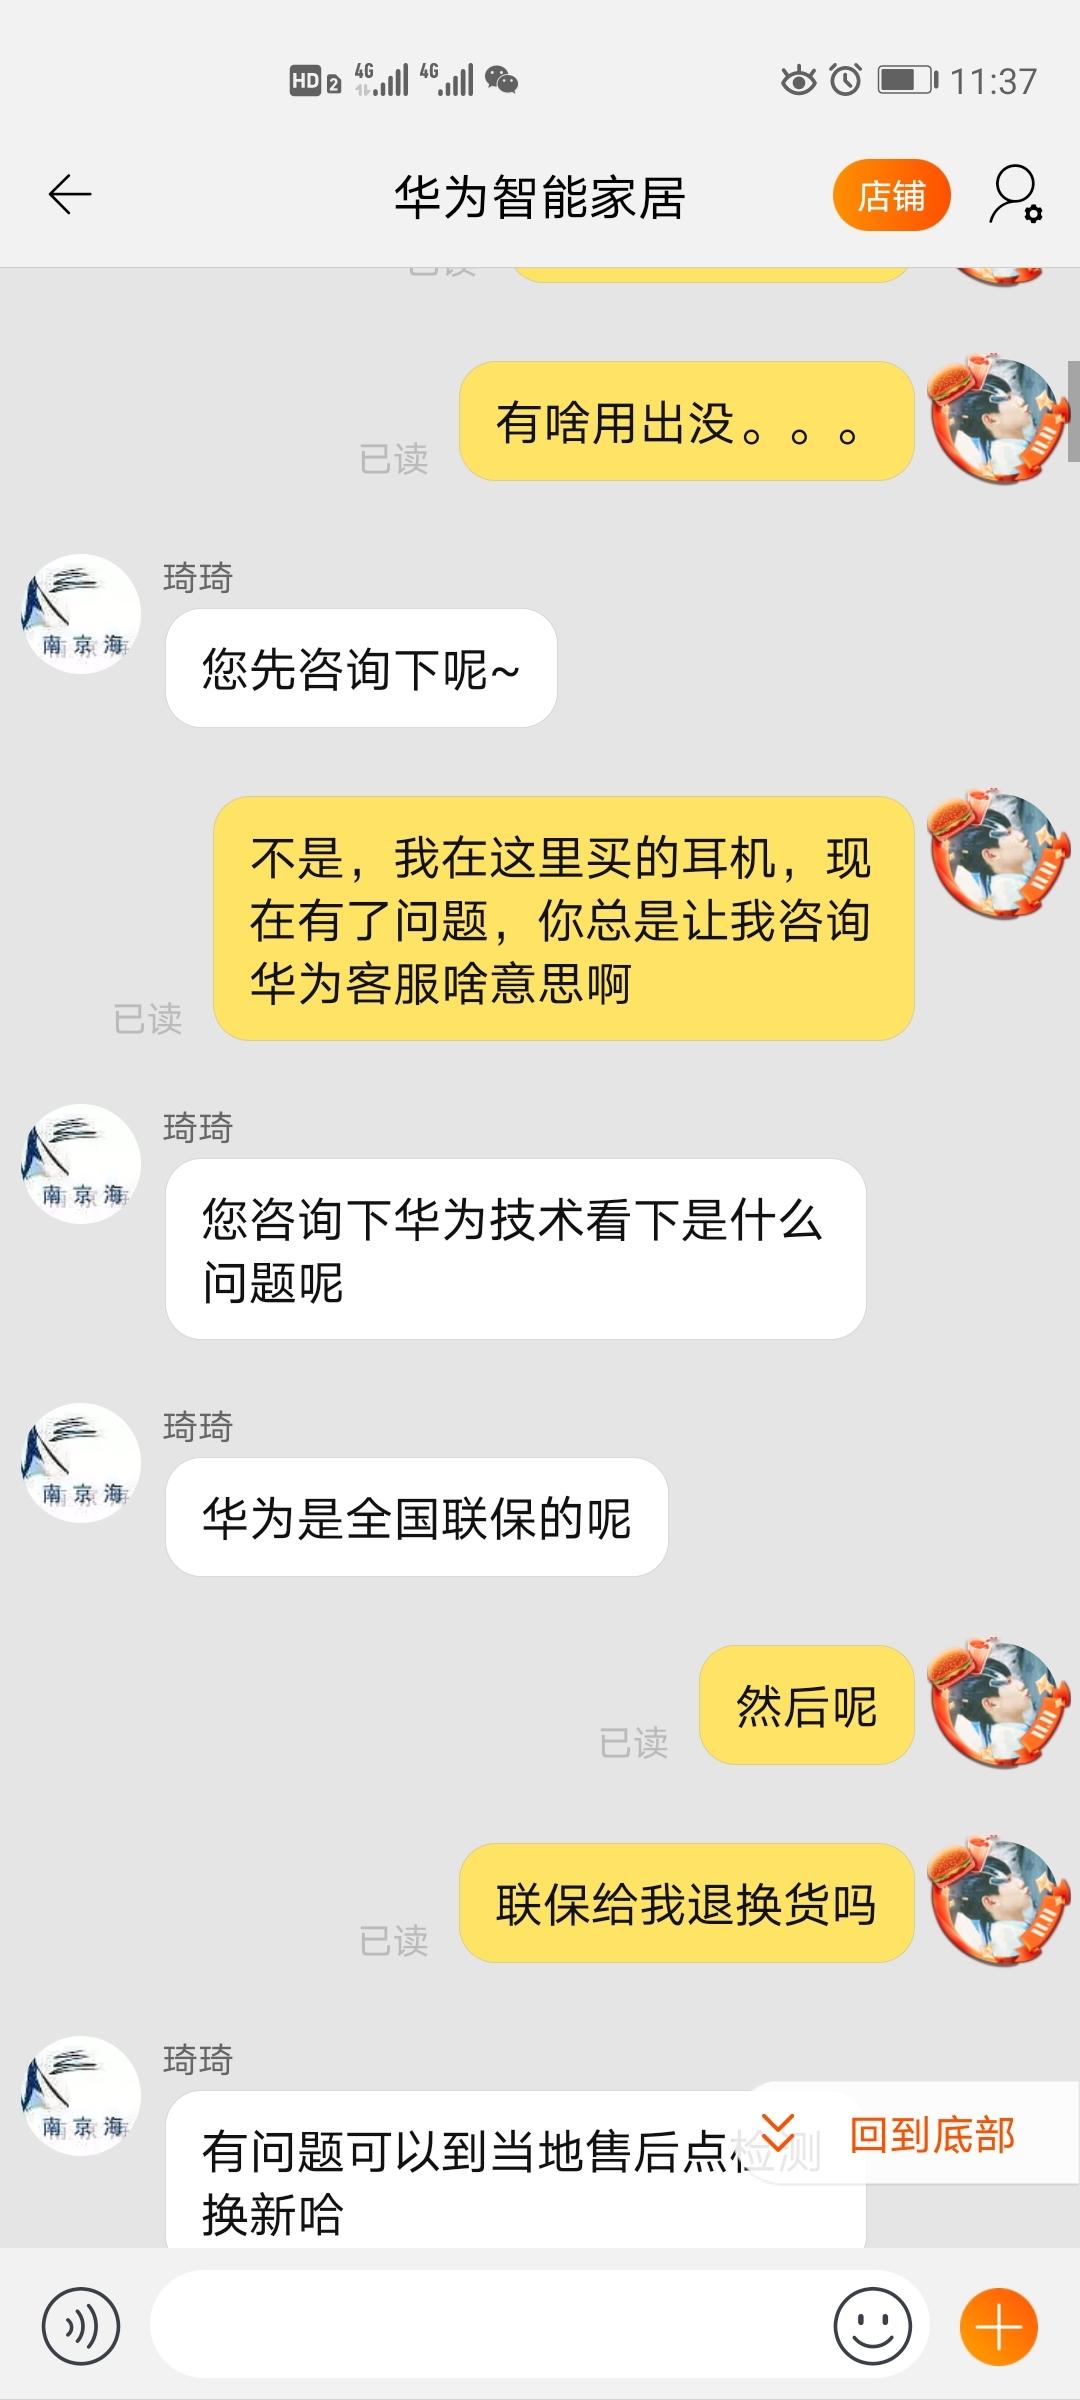 Screenshot_20200508_113713_com.taobao.taobao.jpg